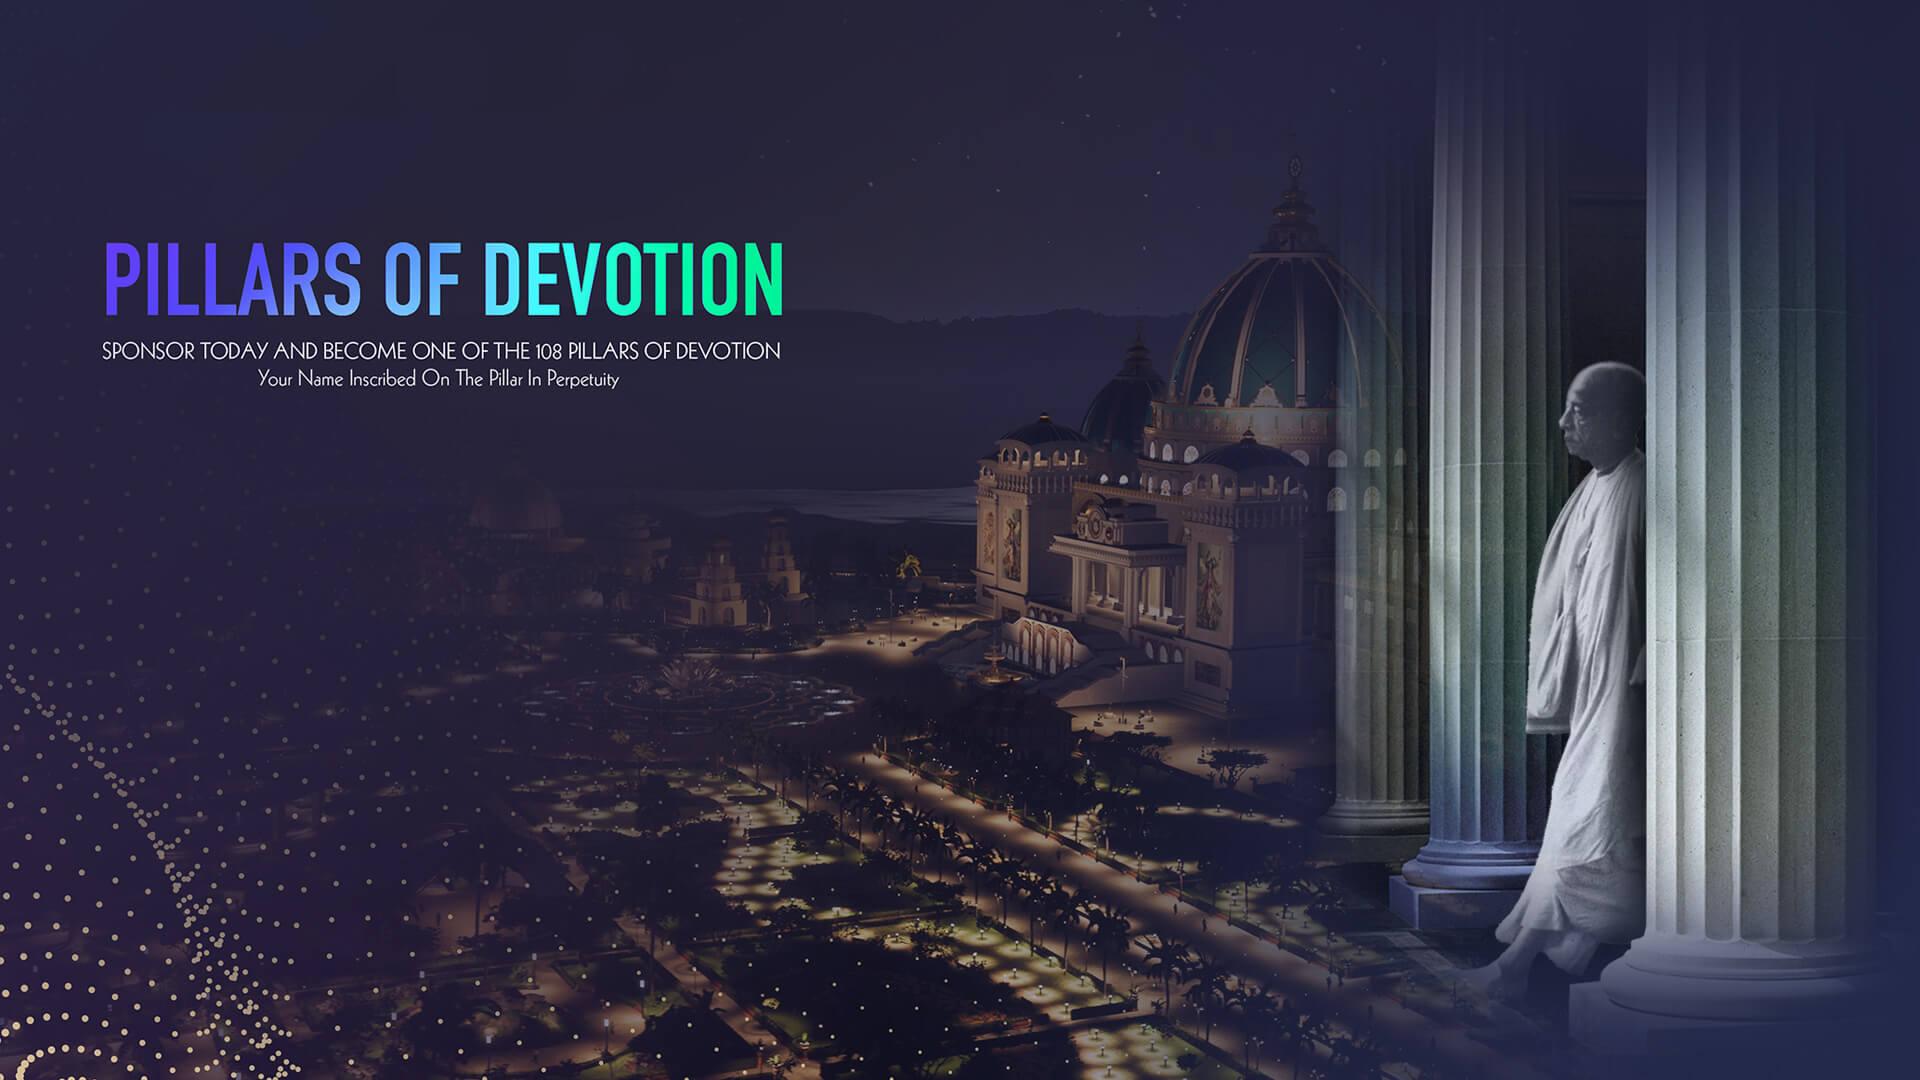 Pillars of Devotion Donation Campaign slide image